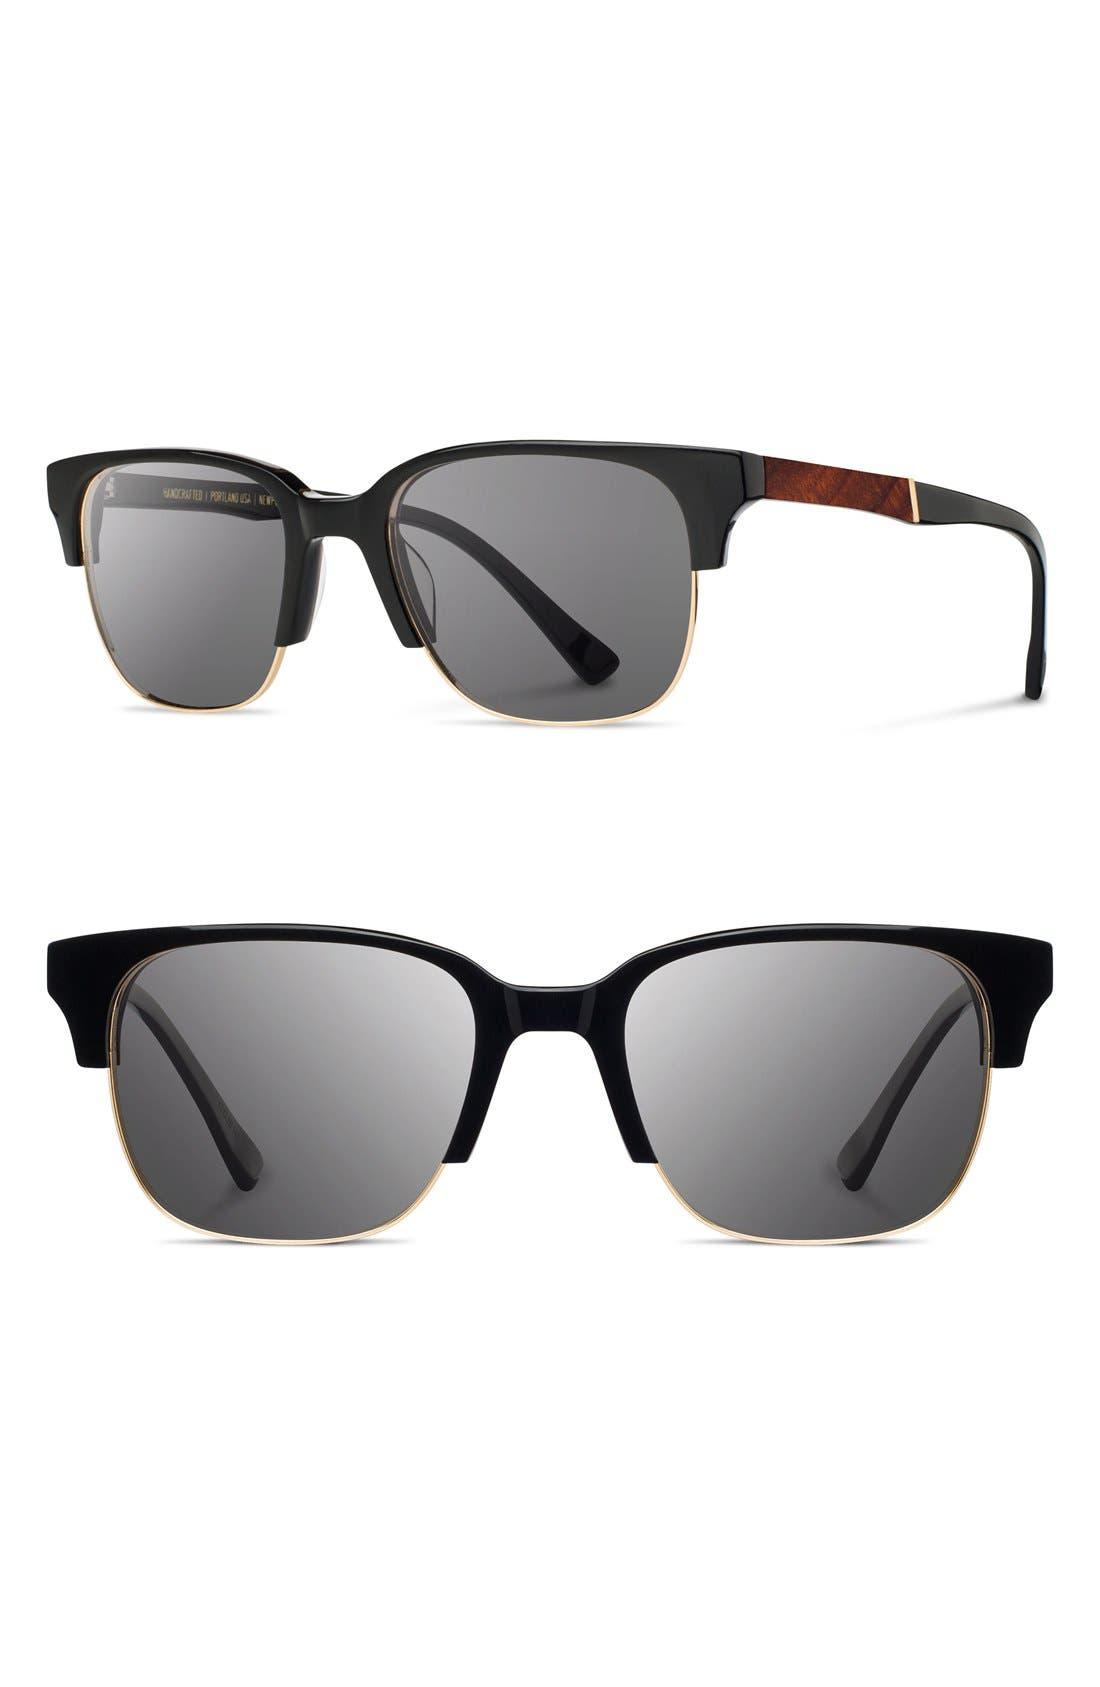 'Newport' Sunglasses,                             Main thumbnail 1, color,                             BLACK/ MAHOGANY/ GREY